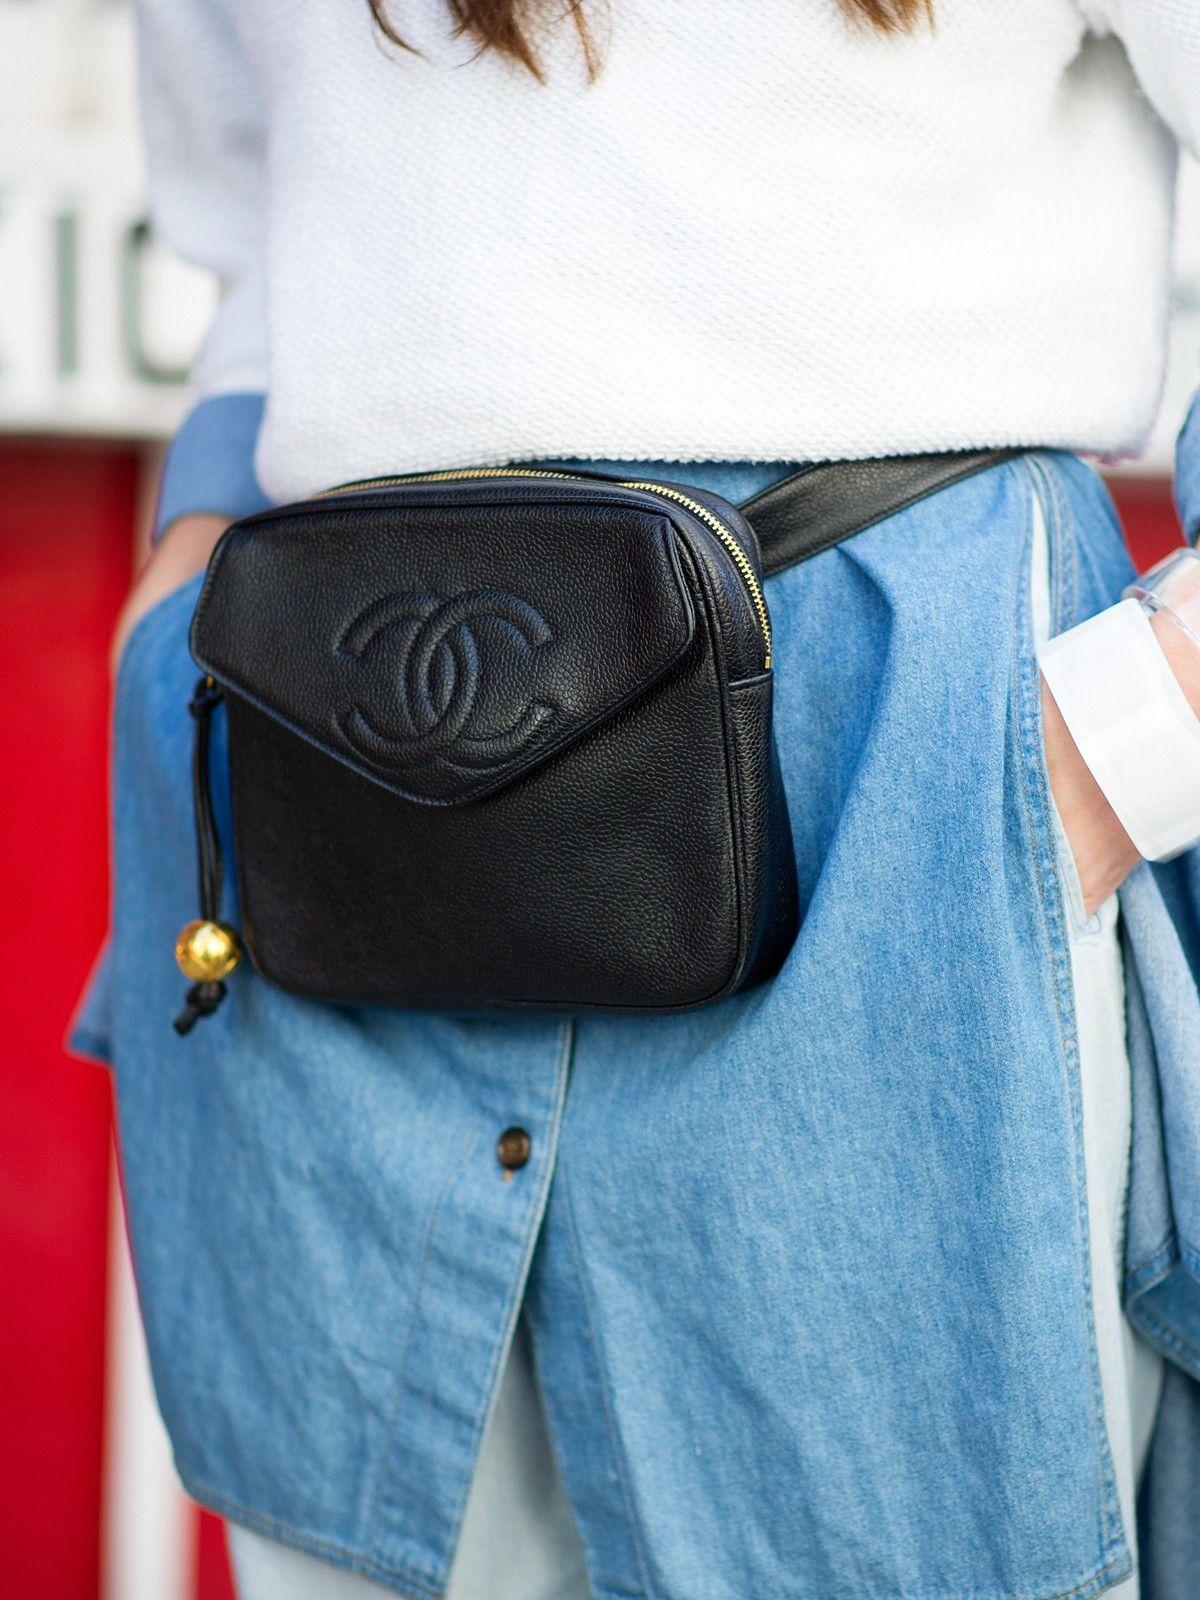 3fdcdcfa09 expensive fanny pack Refinery29 Shops: Chanel hip pack - Wonderland ...